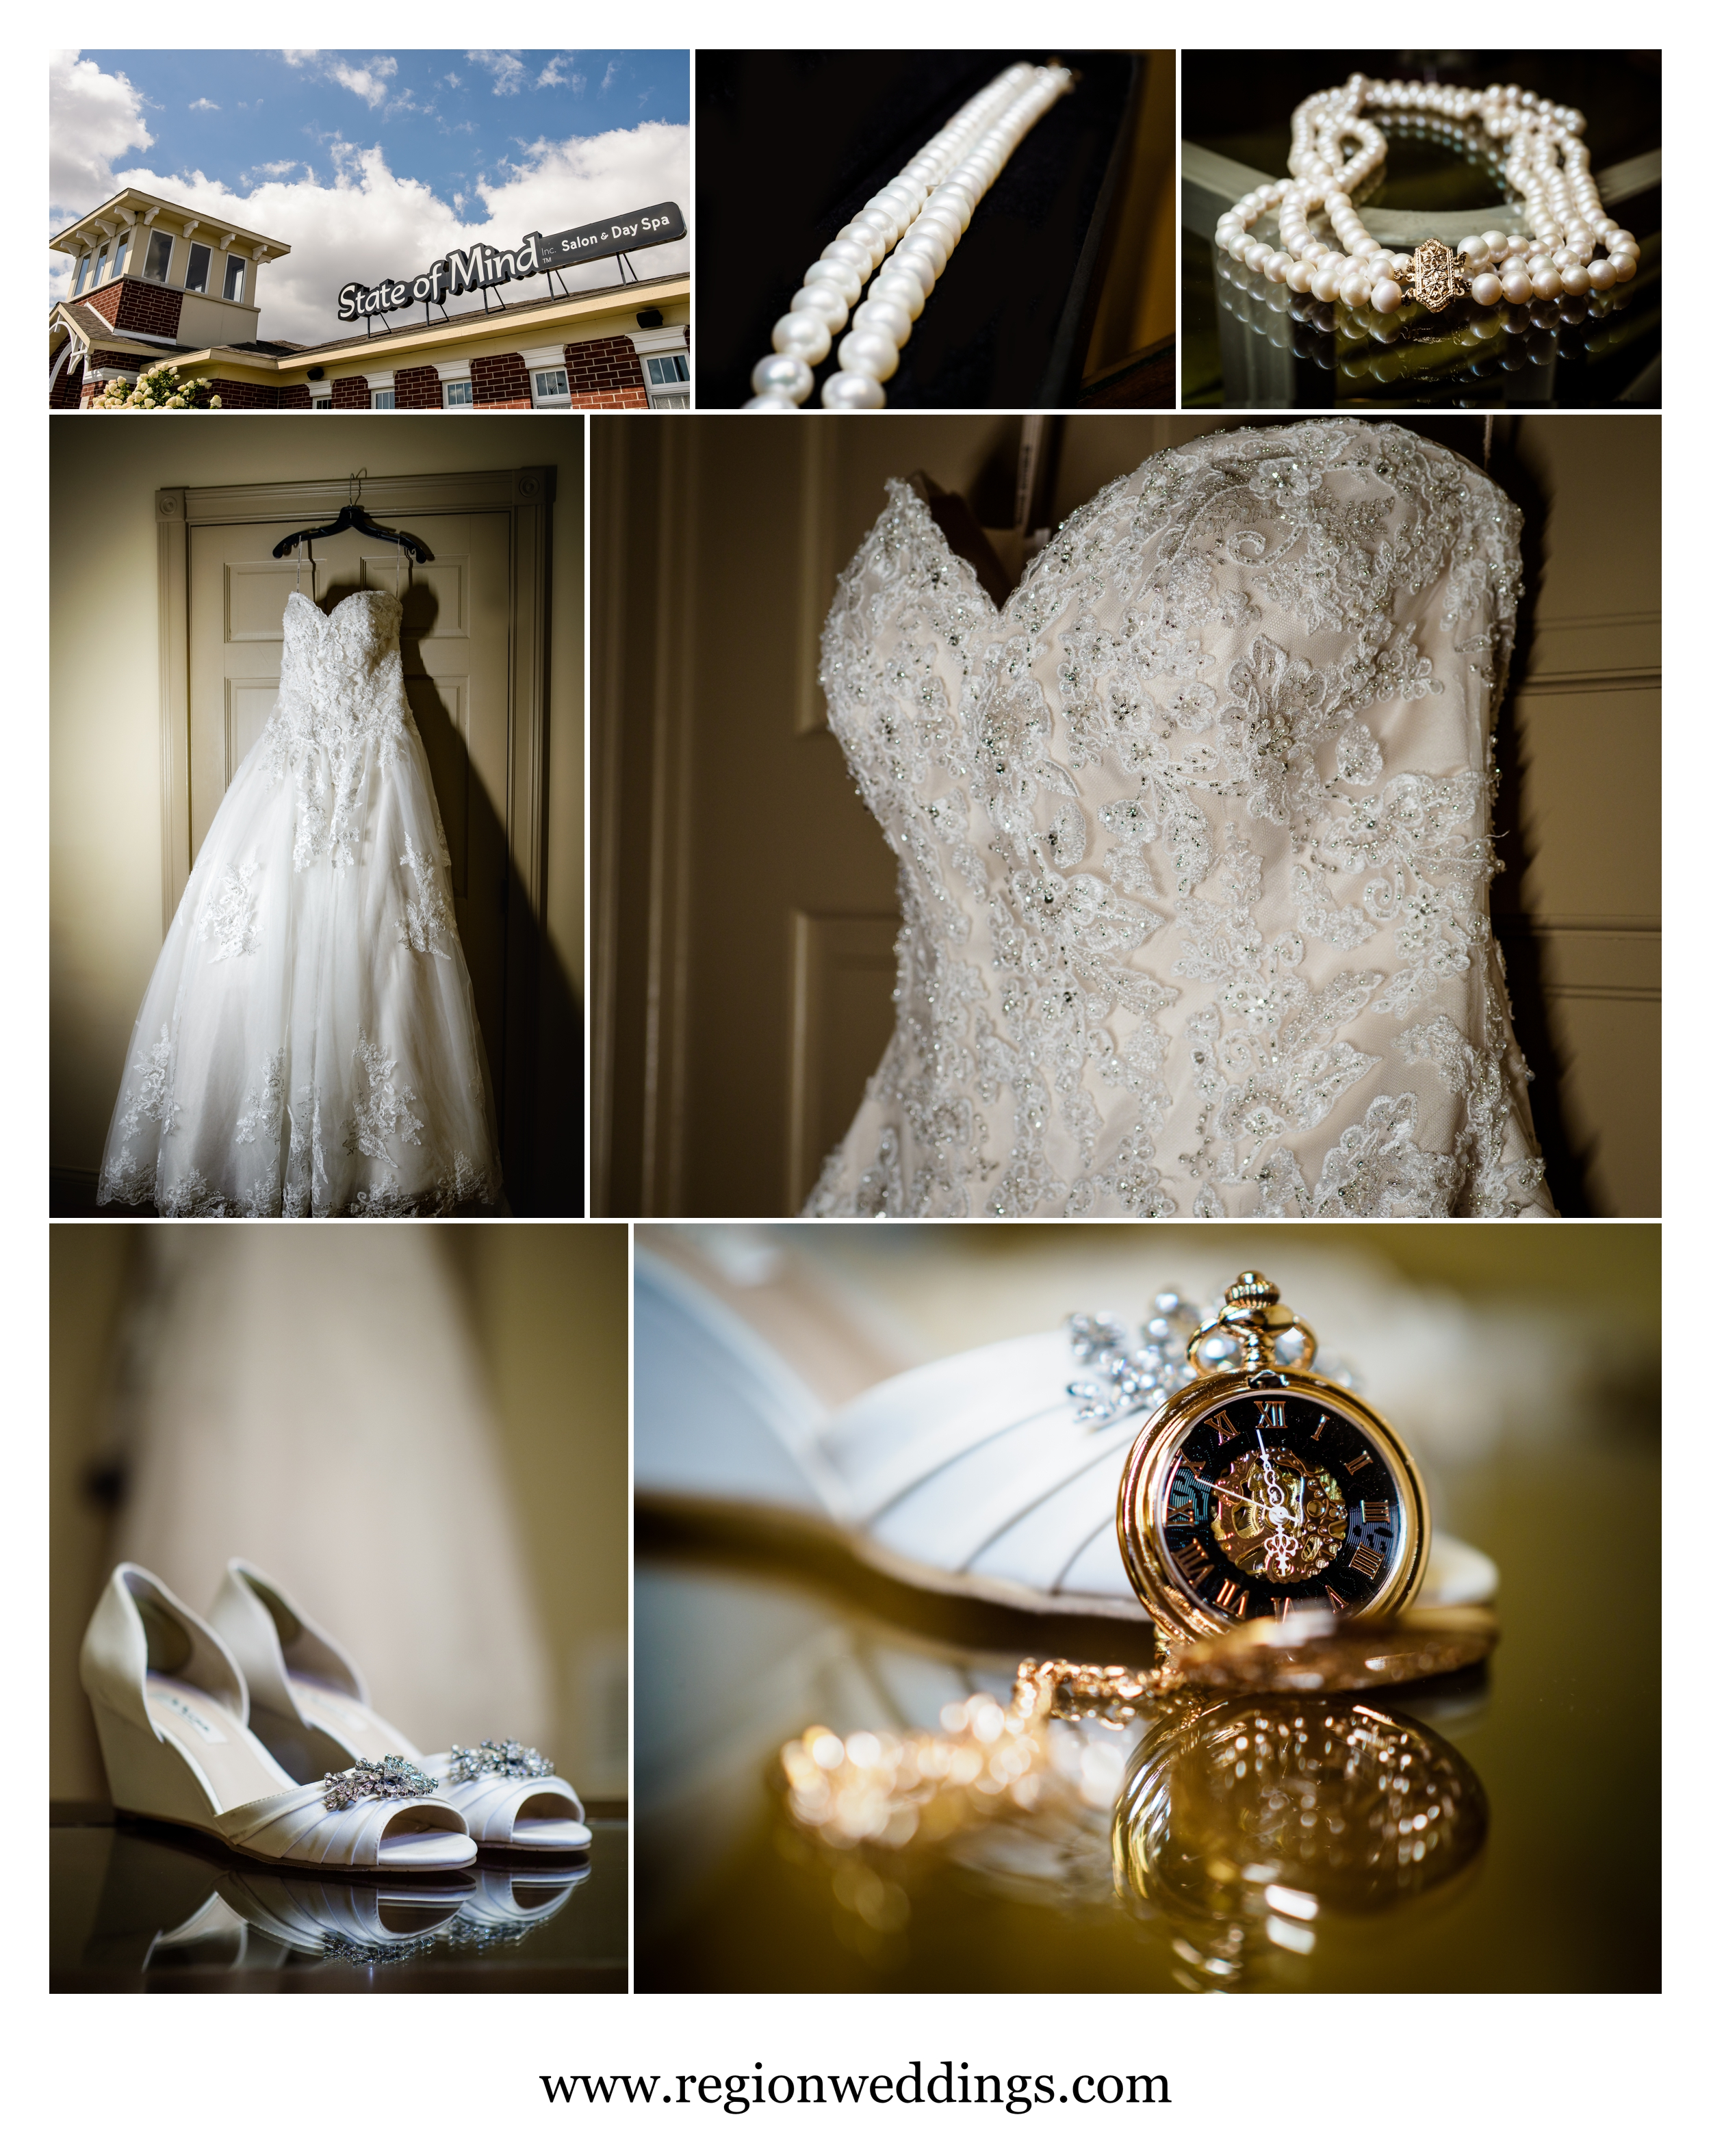 Vintage glamour wedding day accessories.